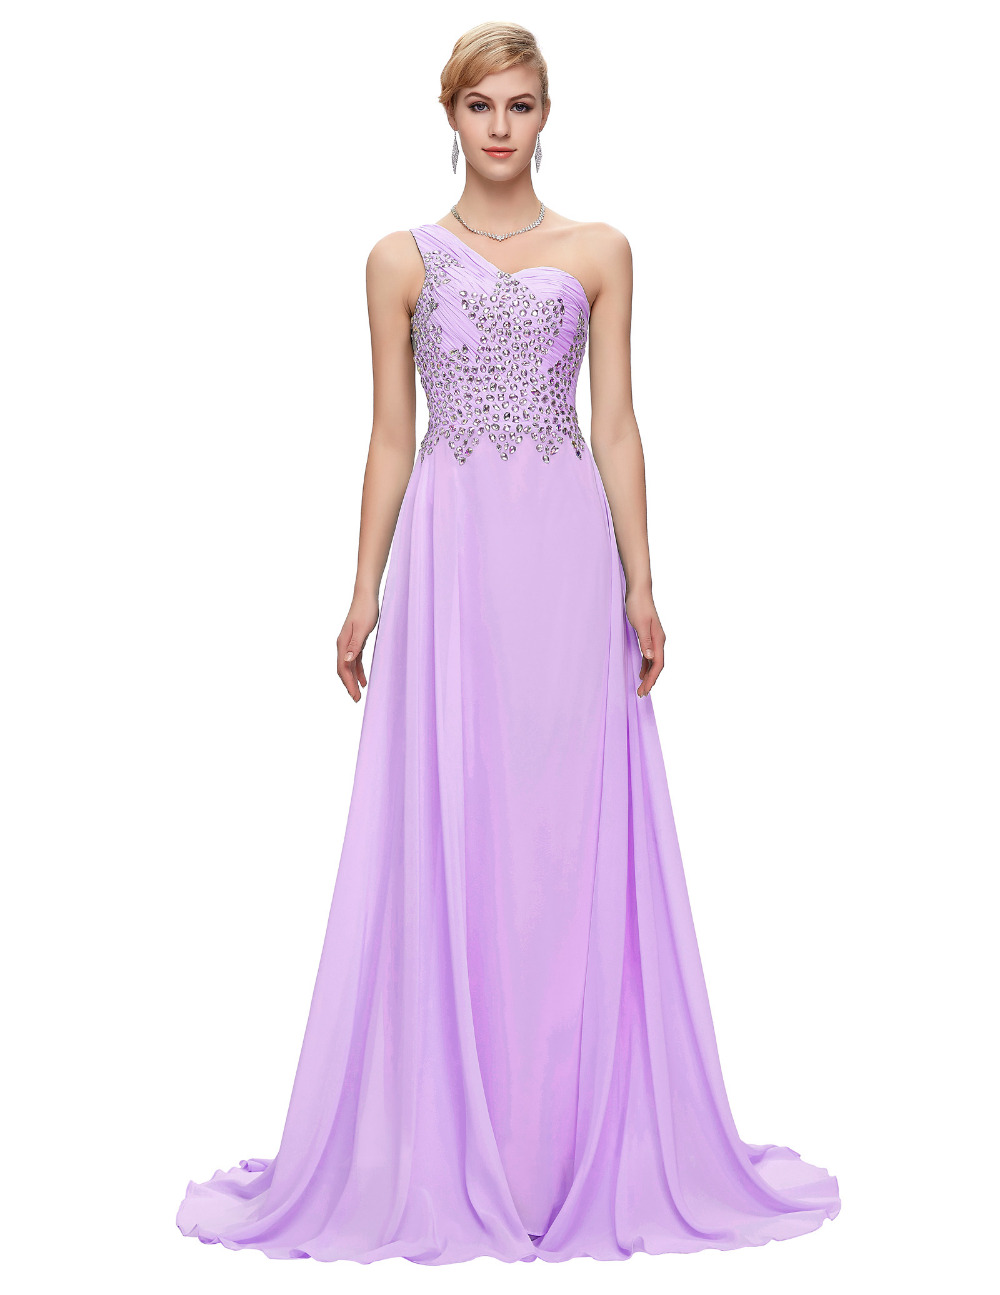 Light Pink And Navy Blue Bridesmaid Dresses - Flower Girl Dresses